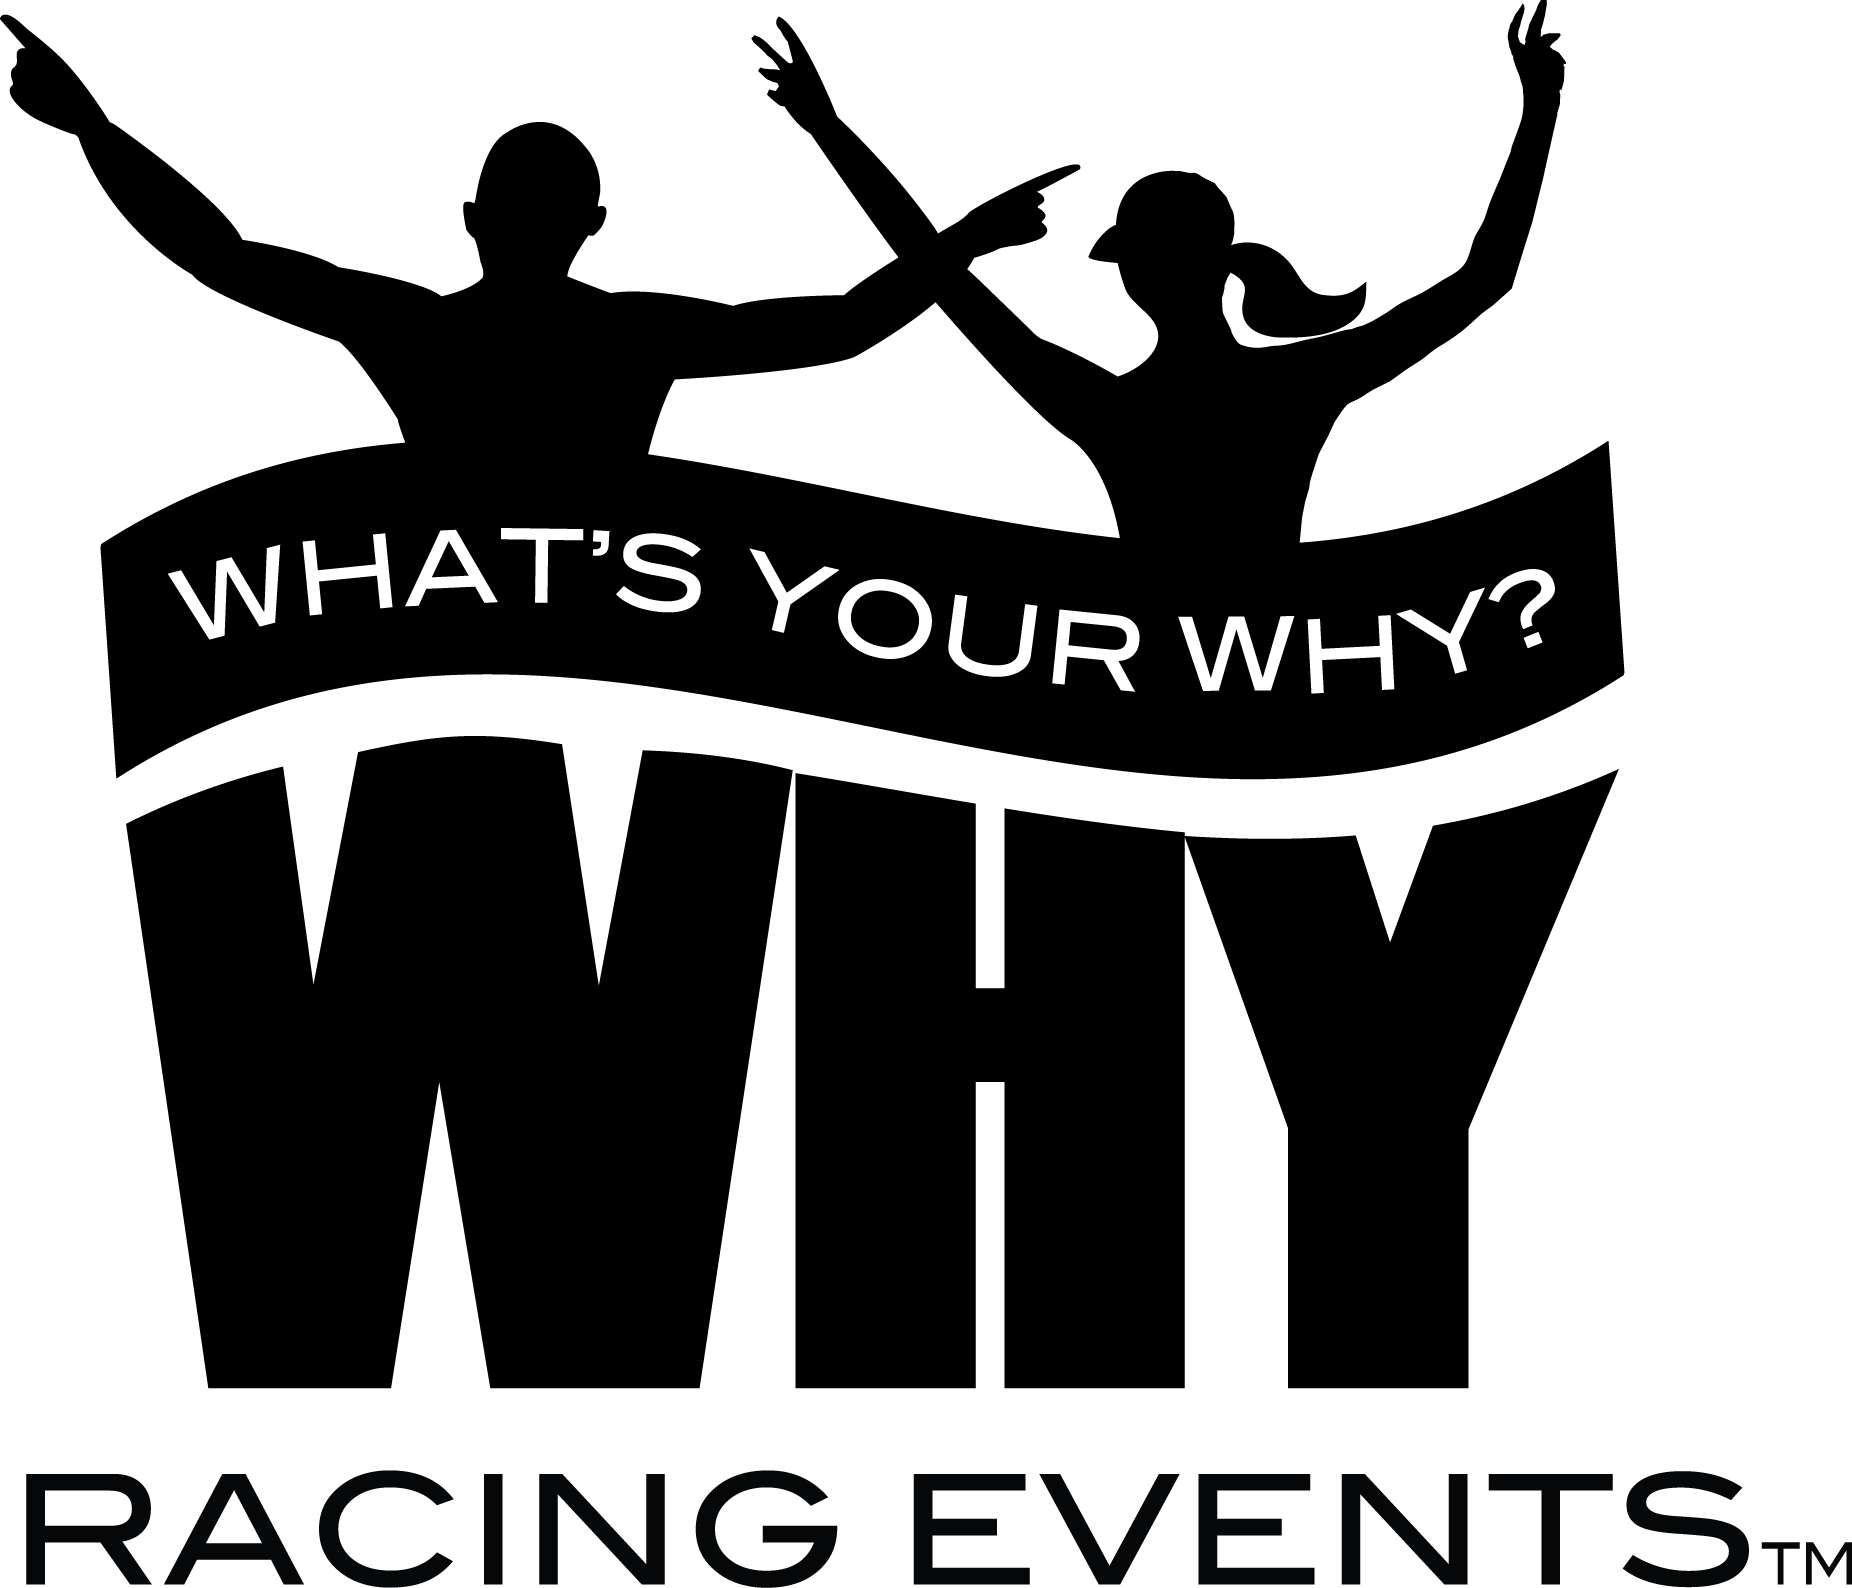 www.whyracingevents.com